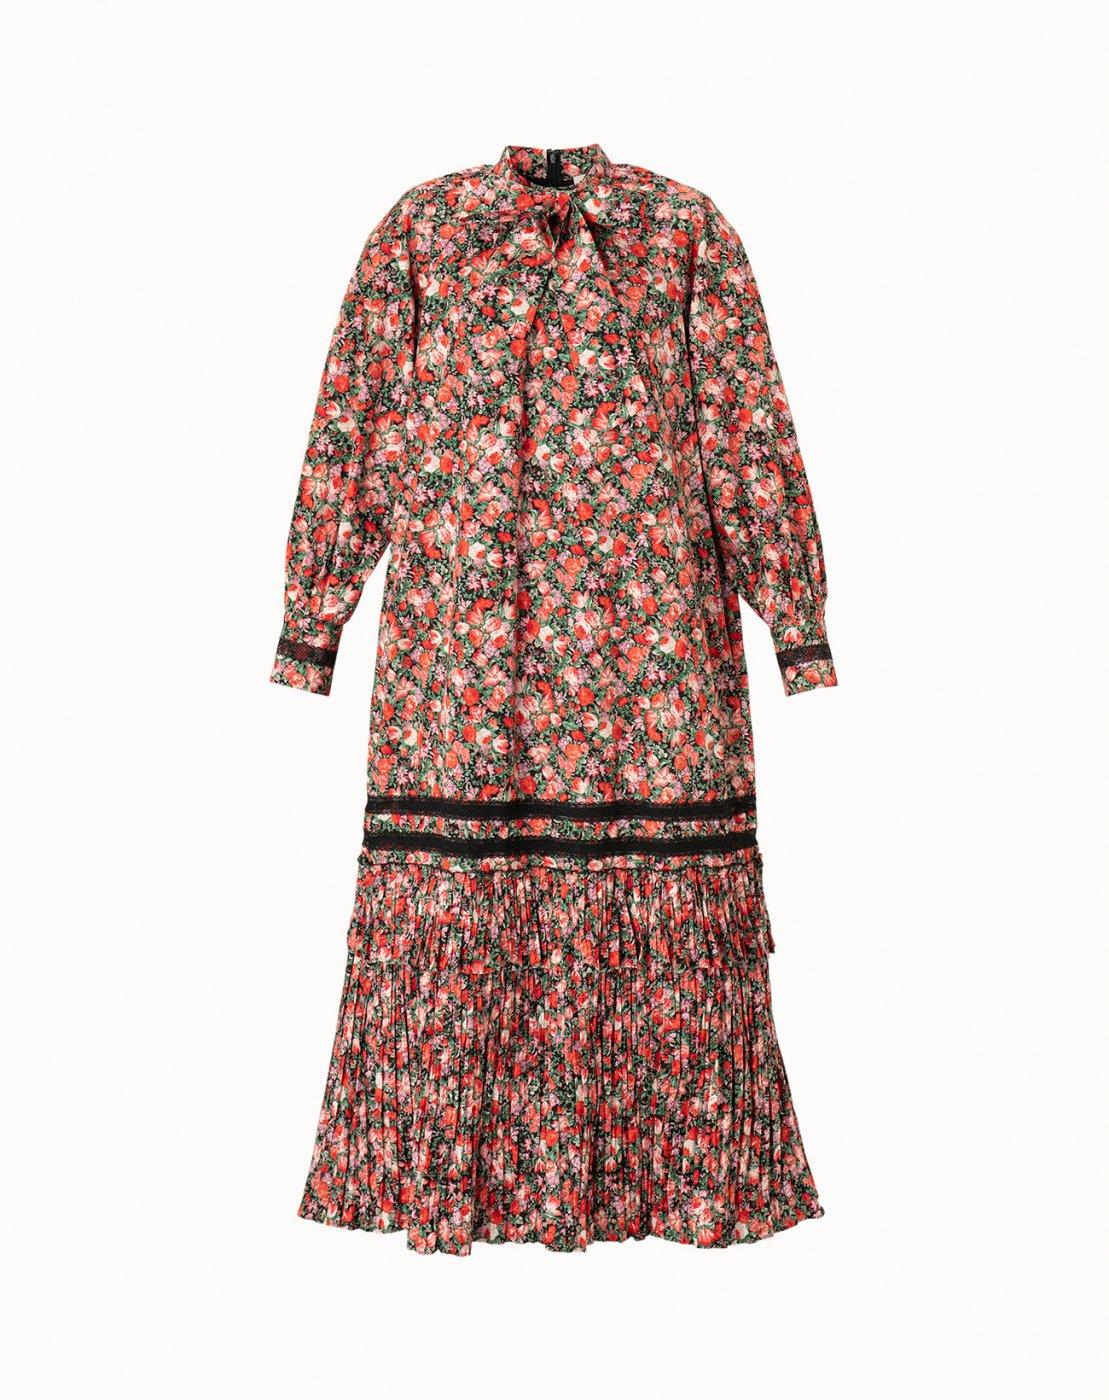 leur logette - Matisse Flower Print Dress - Red